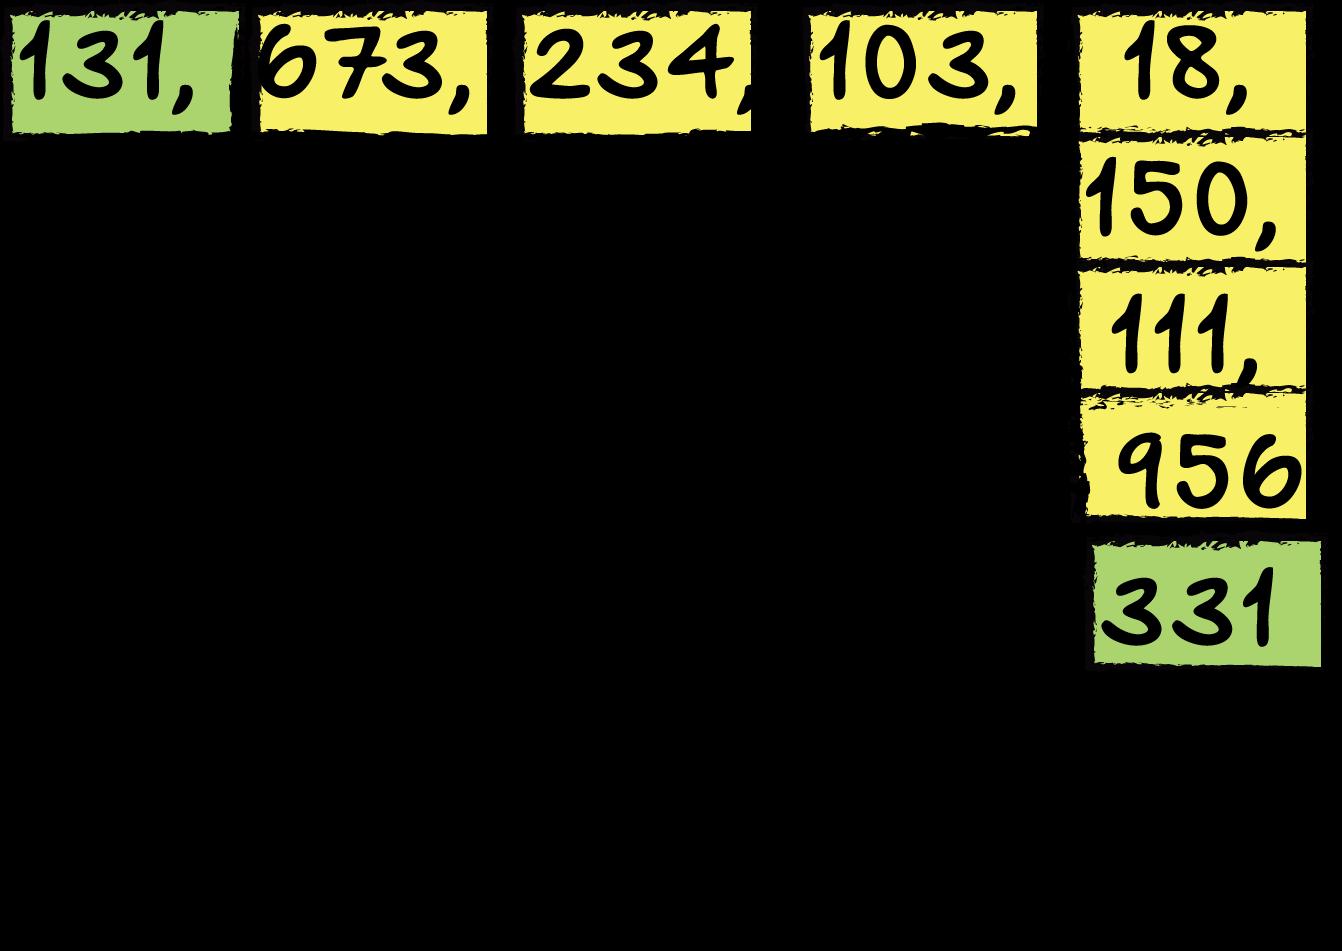 Minimum Cost Path Analysis (Python) - By